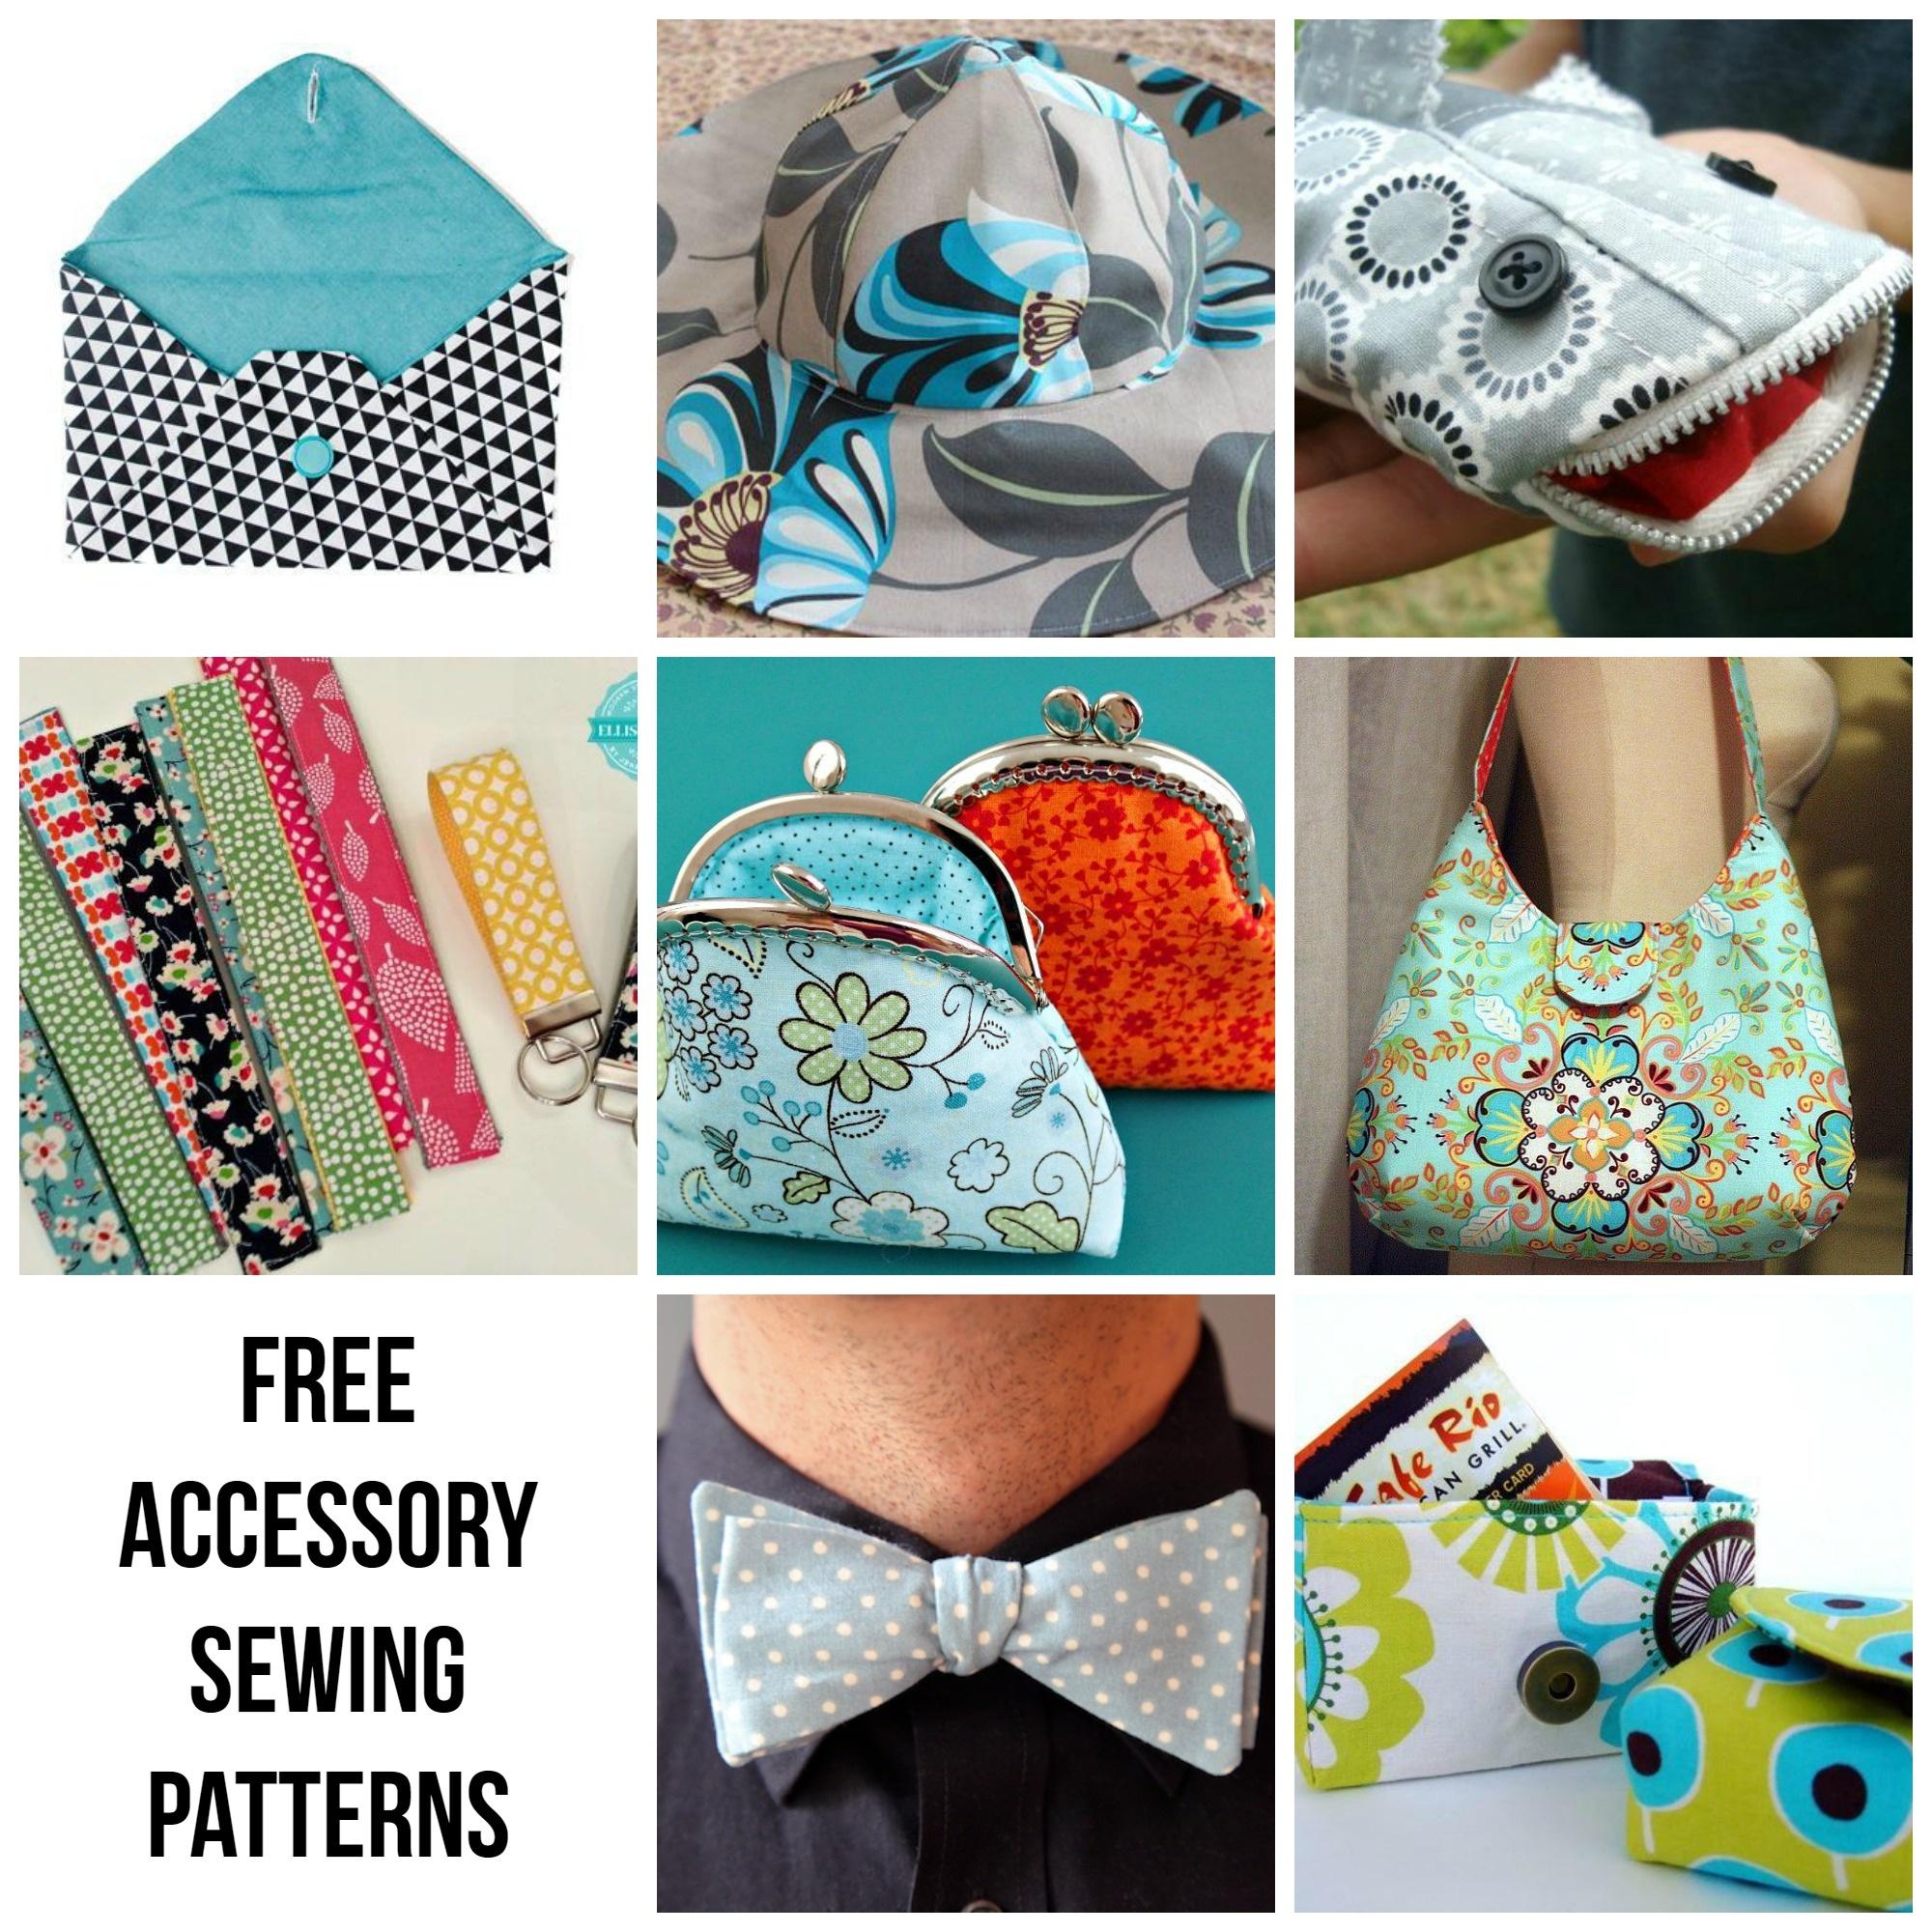 Free Handbag Patterns: Top 10 Purses To Sew - Free Printable Purse Patterns To Sew